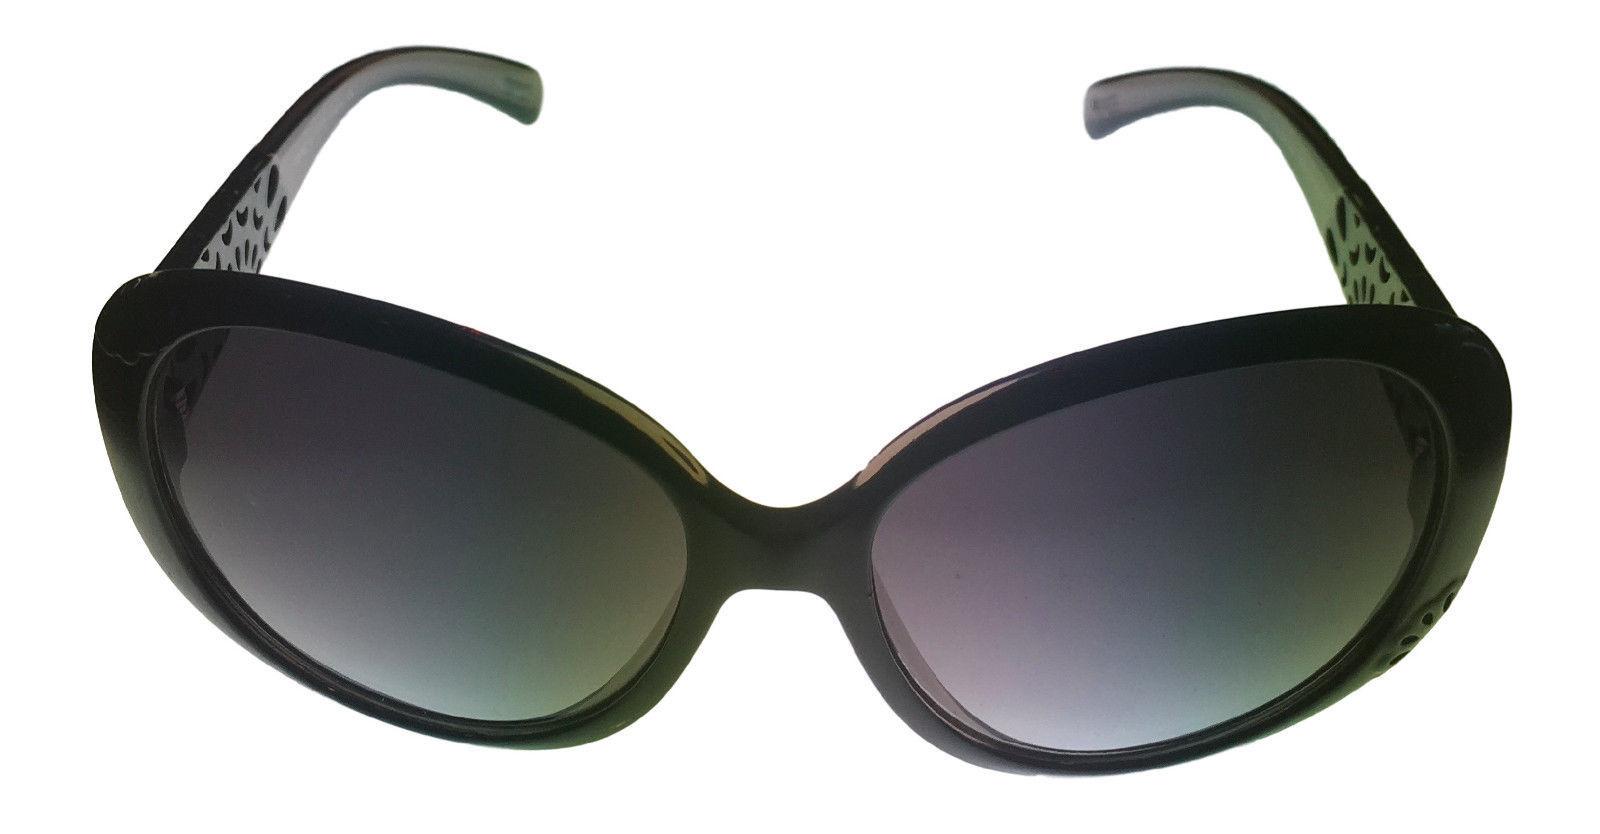 Smoke Gradient Lens 19377 538 Clear  Fashion Wrap Esprit Sunglass Black